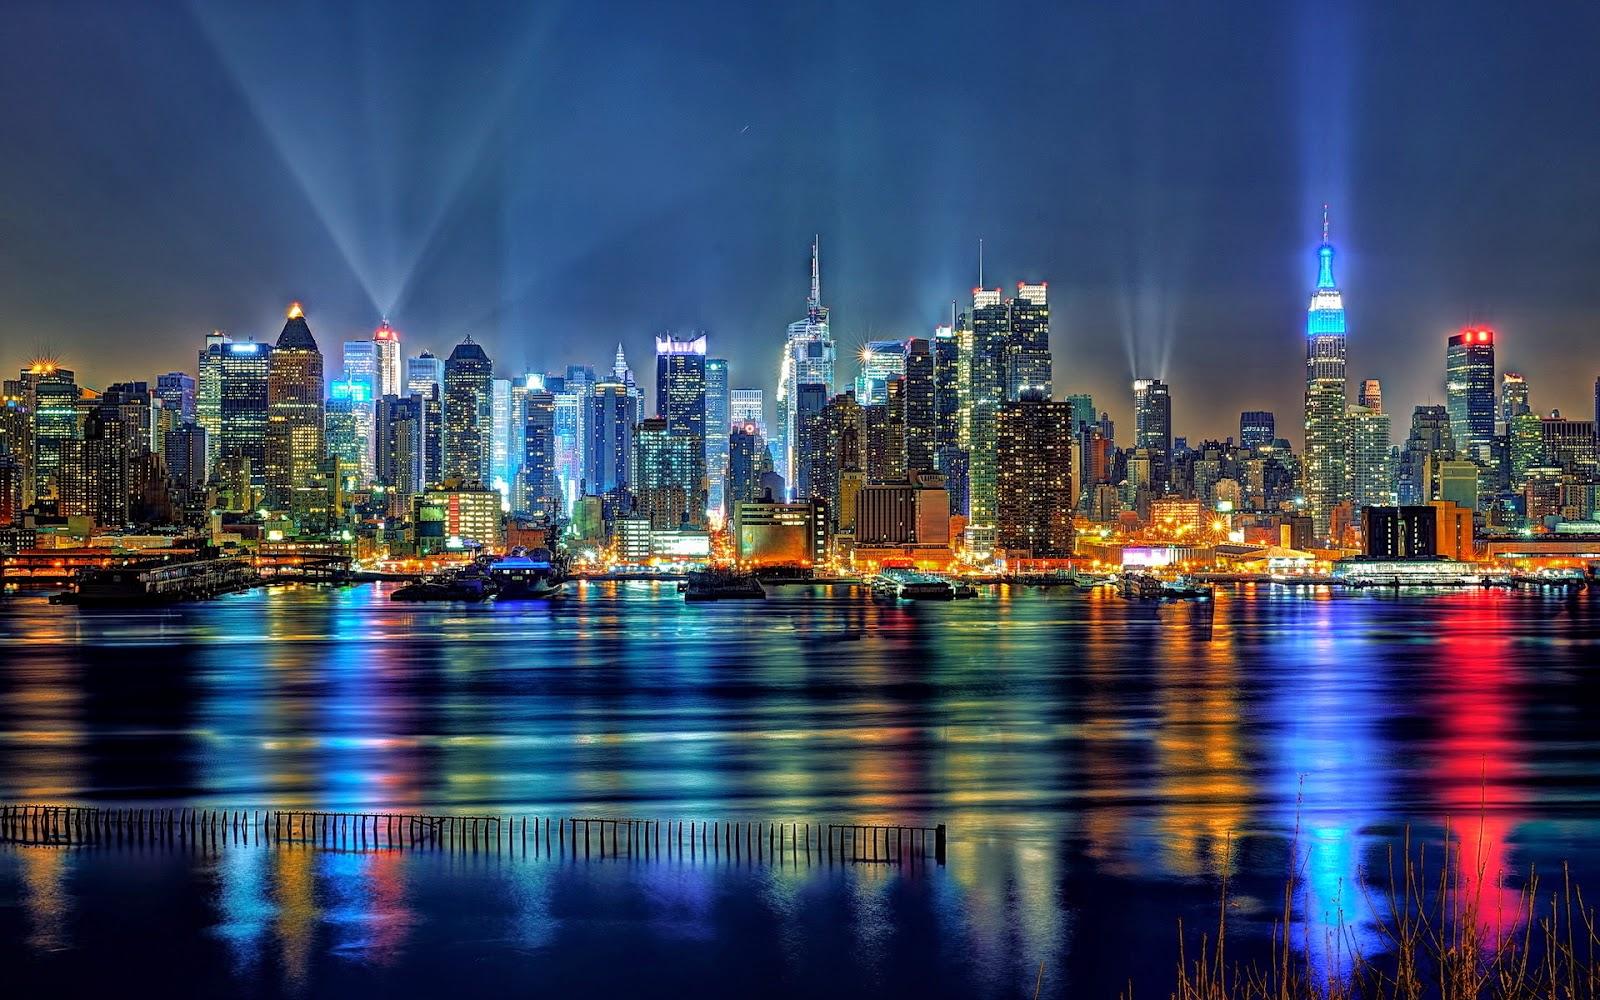 Free Download New York City Wallpaper Desktop Wallpapers Hd 1600x1000 For Your Desktop Mobile Tablet Explore 75 New York Wallpaper Desktop New York Wallpapers New York City Wallpaper New Hd Wallpaper